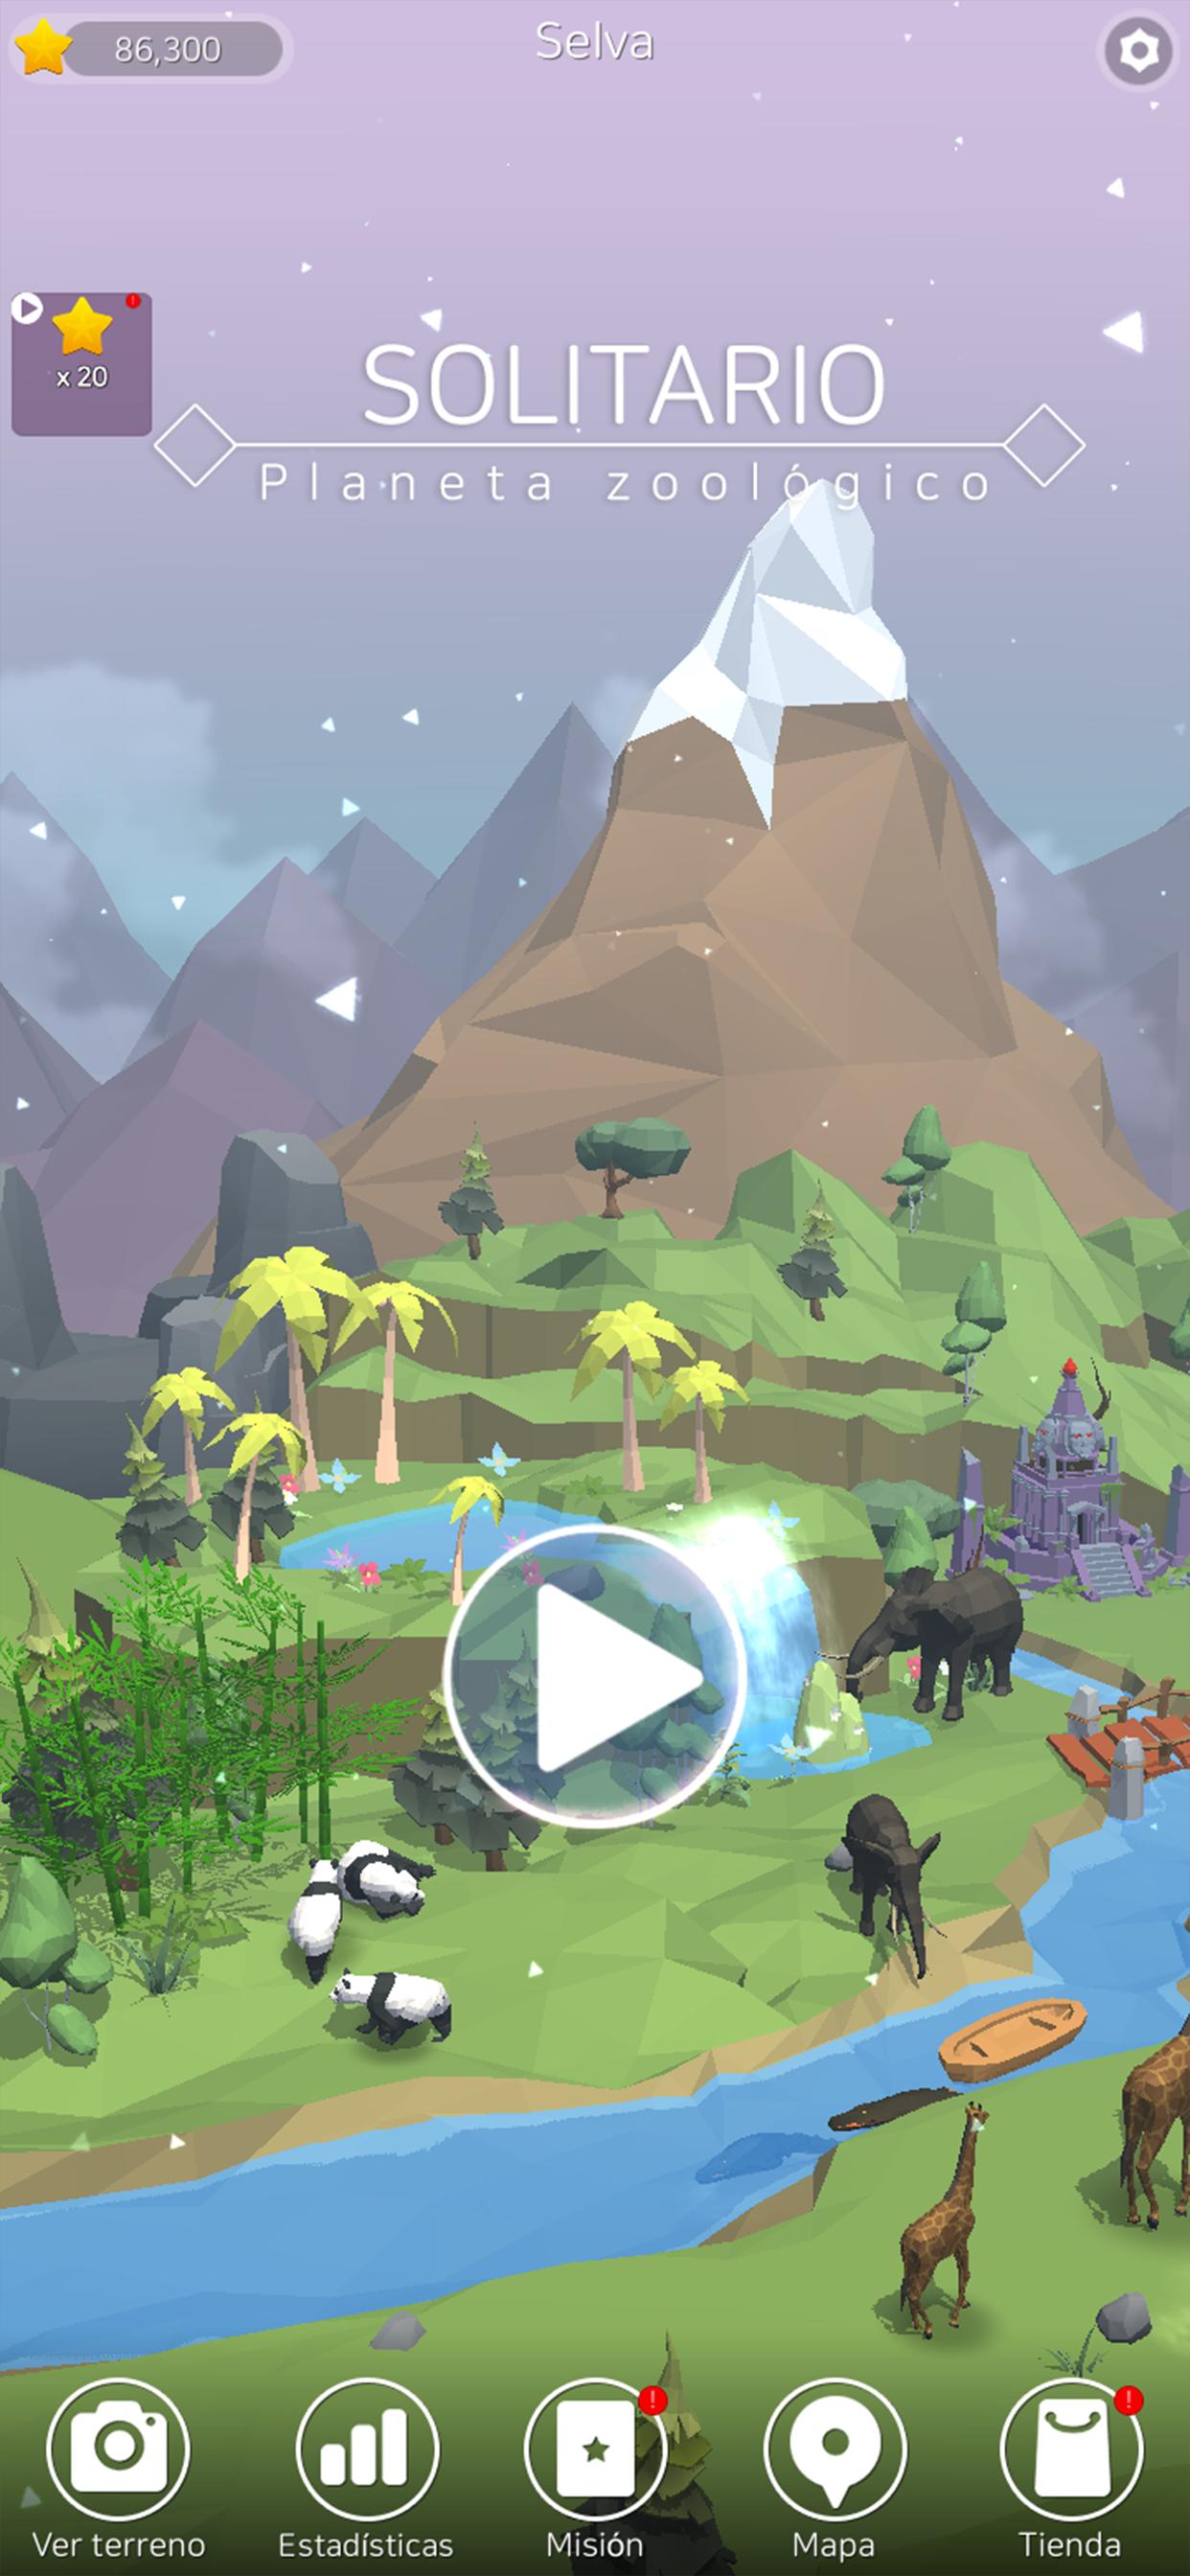 Screenshot 1: Planeta zoológico solitario